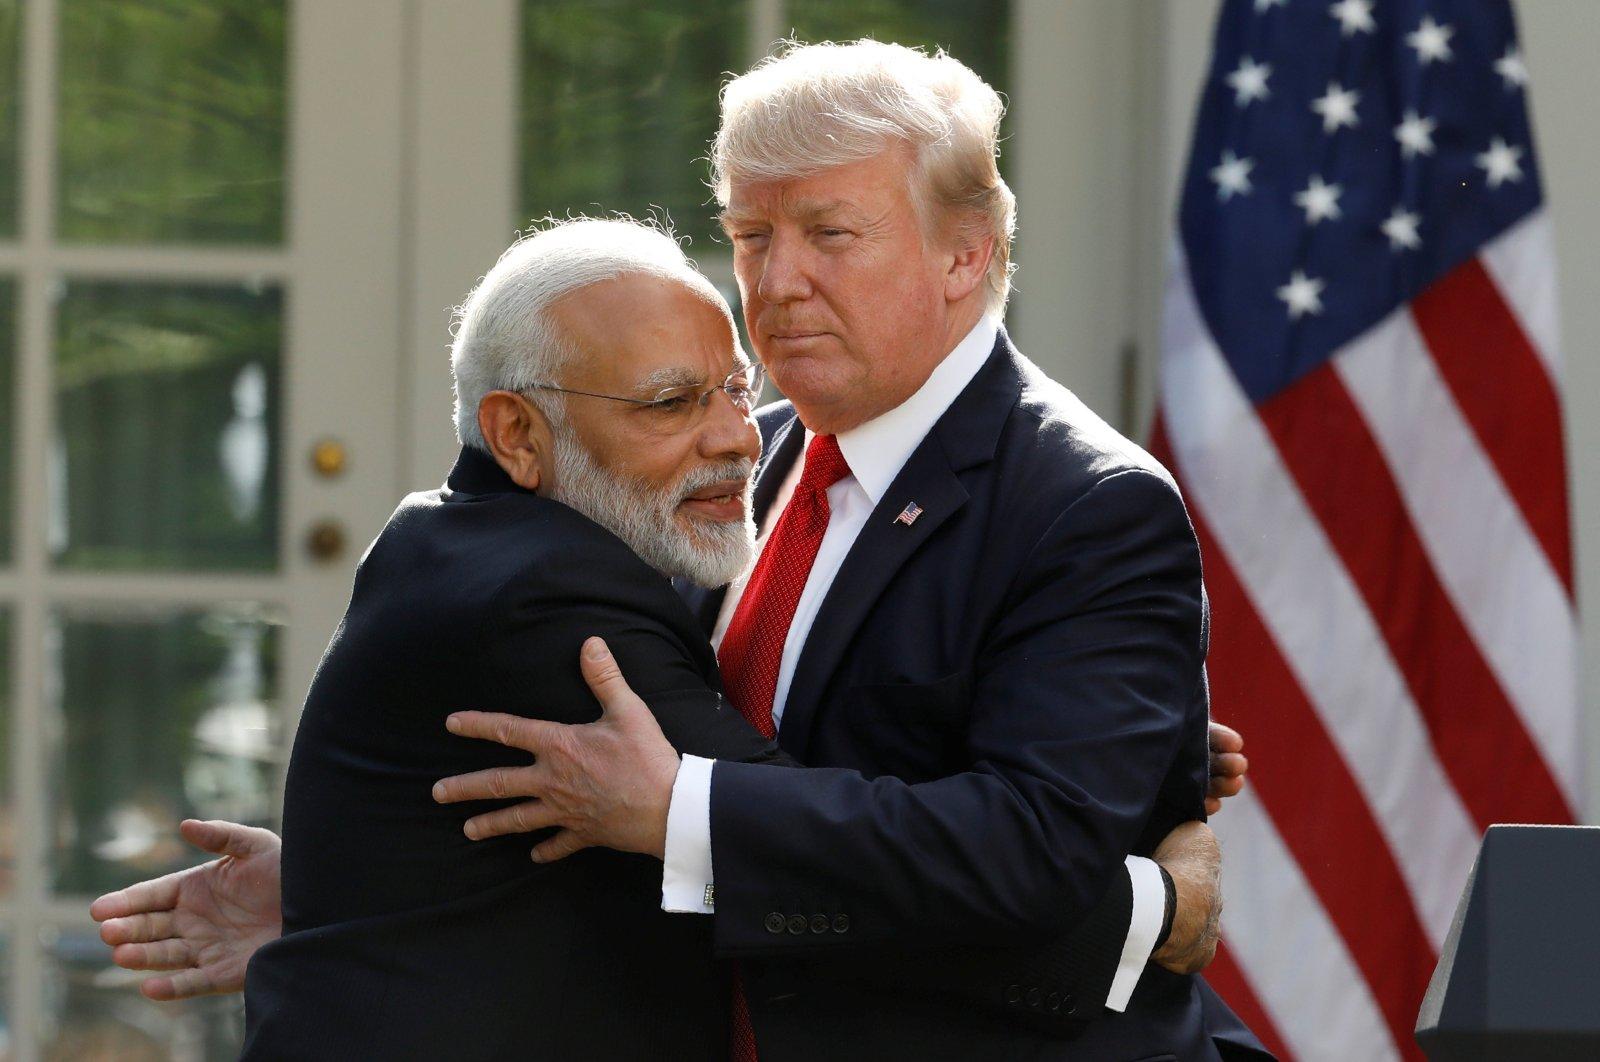 India's Prime Minister Narendra Modi hugs U.S. President Donald Trump in the Rose Garden of the White House, Washington, D.C., June 26, 2017. (REUTERS Photo)